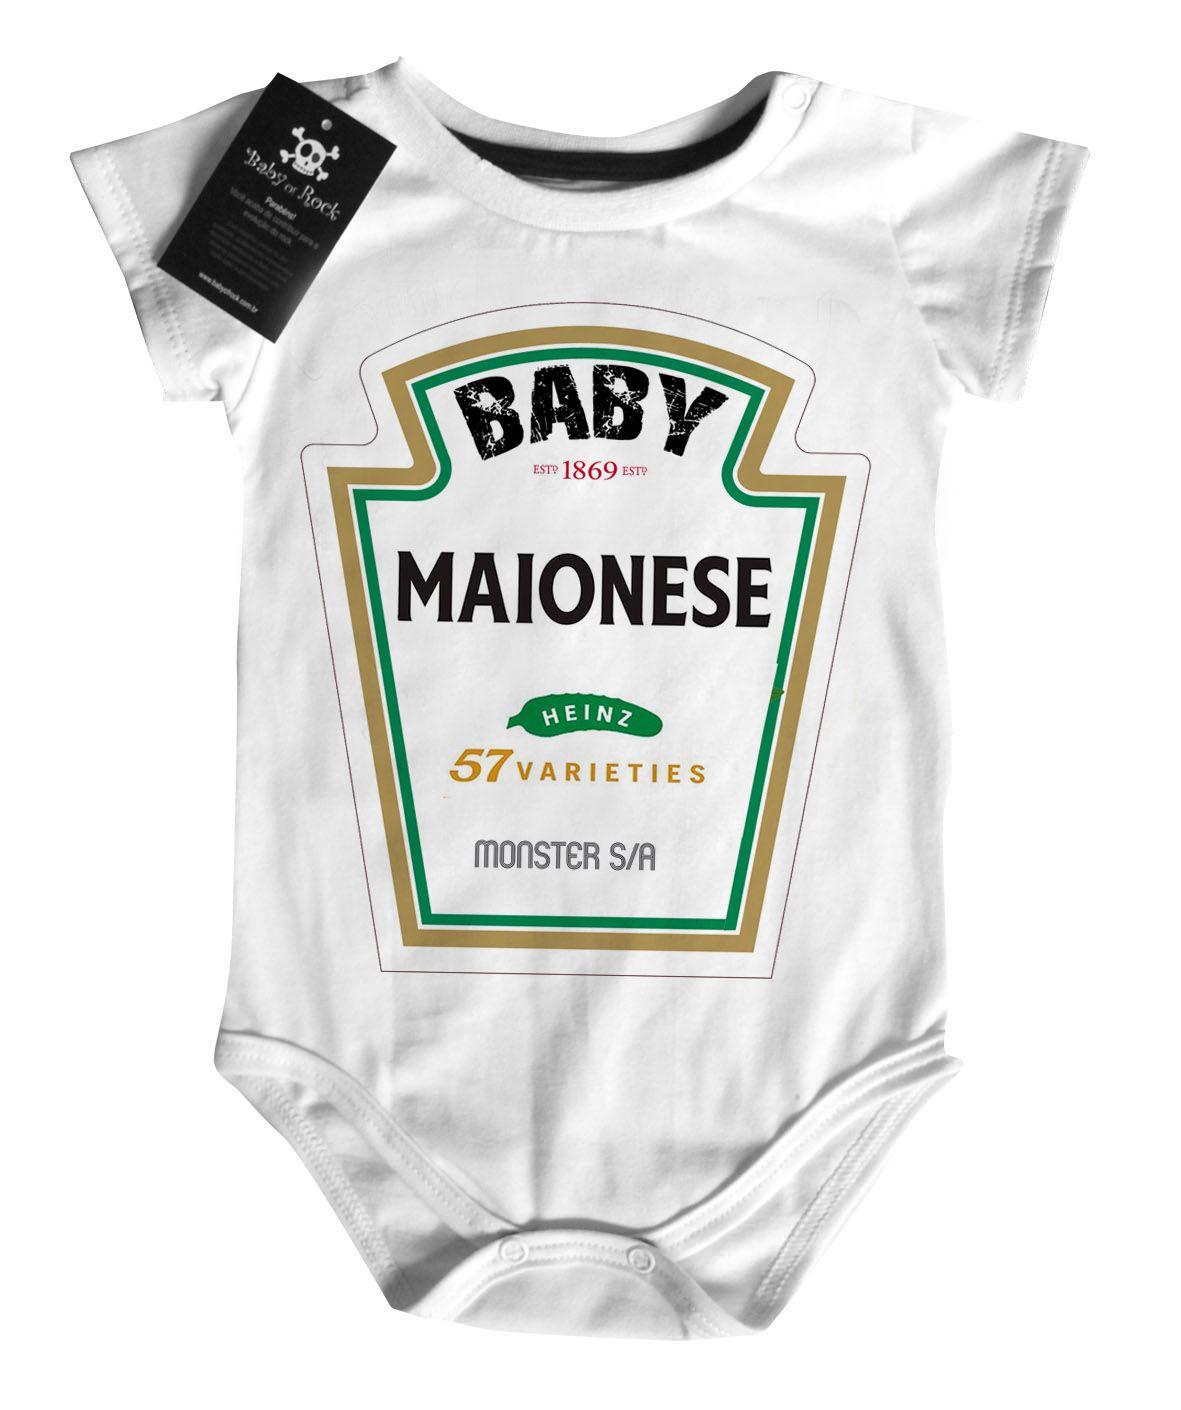 Body Baby Divertido Criativo - Baby Maionese - White  - Baby Monster S/A